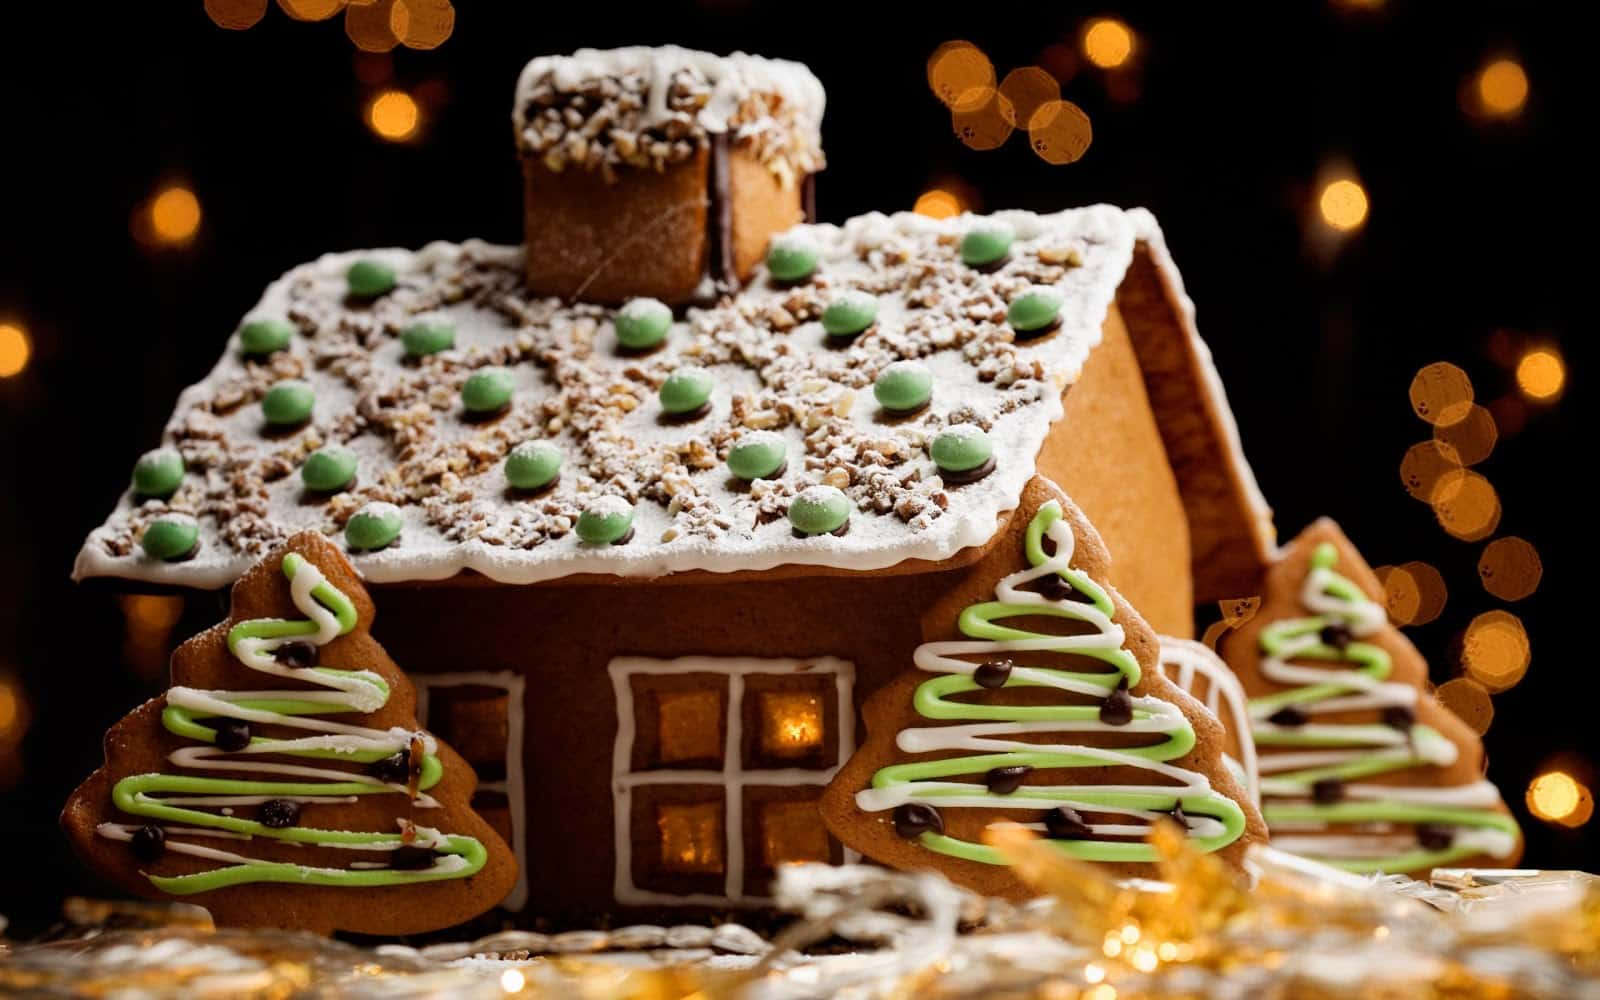 Мастер-классы по кулинарии Мастер-классы по кулинарии Christmas Cake HD Wallpapers 7